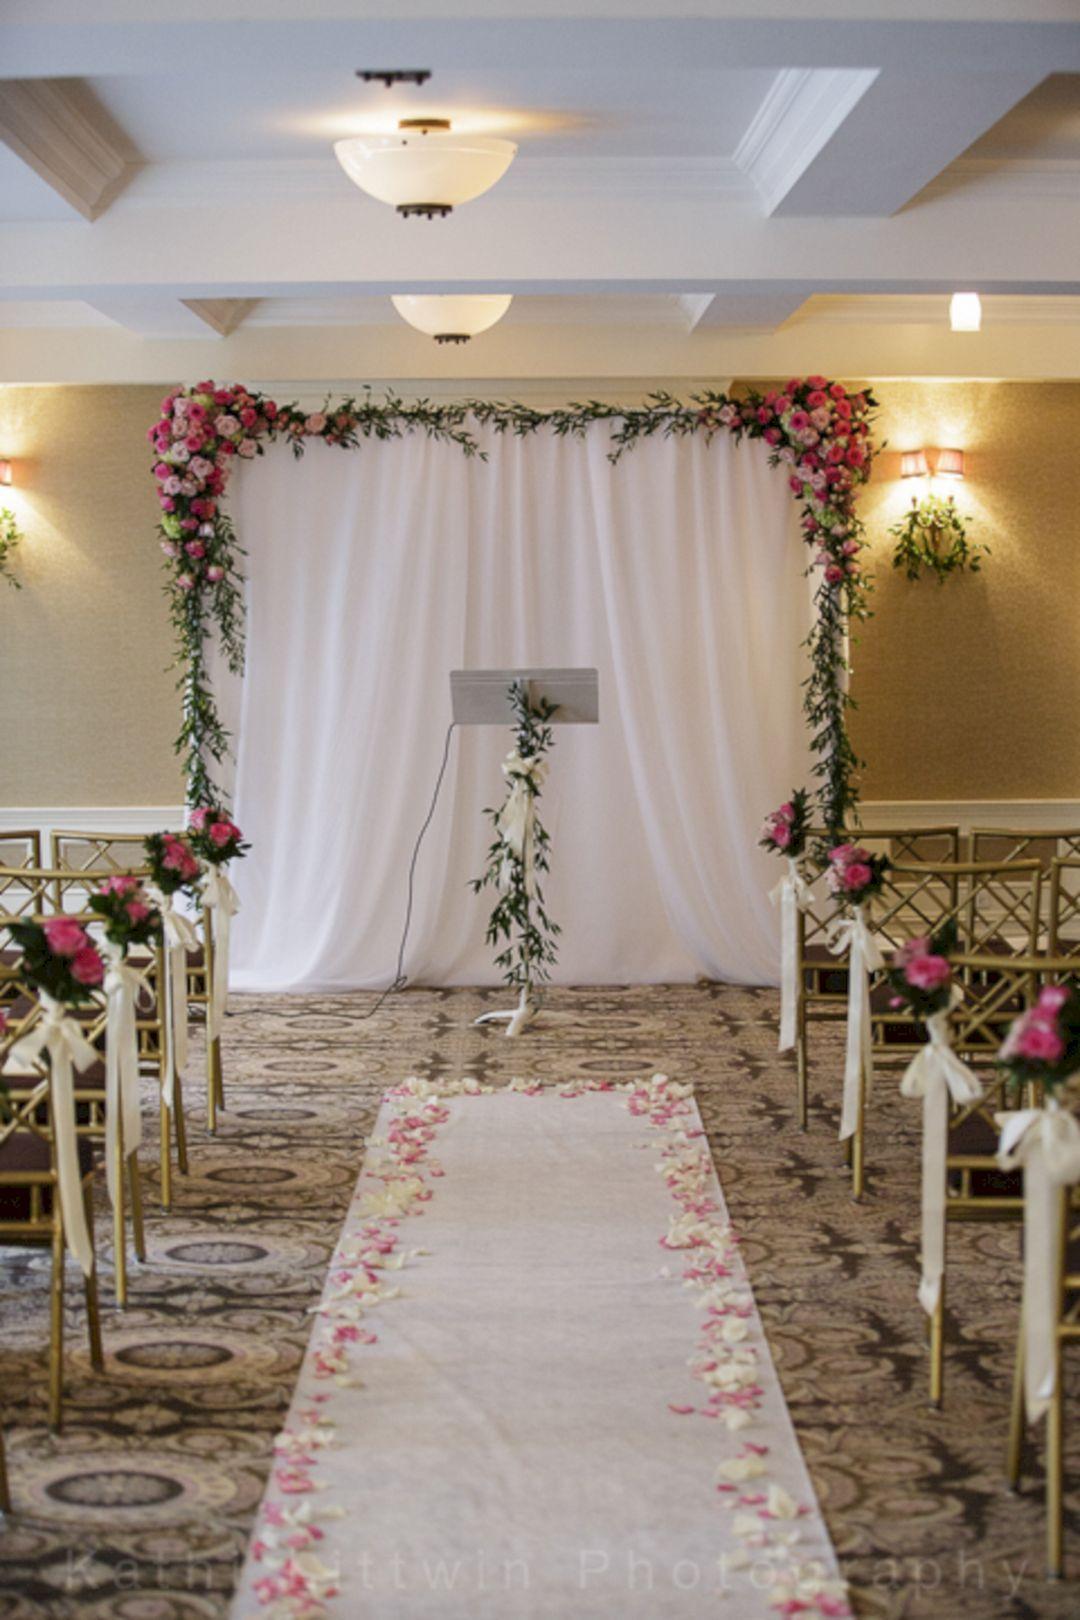 30 Simple Wedding Backdrop Ideas For Your Wedding Ceremony  decoration  Wedding reception